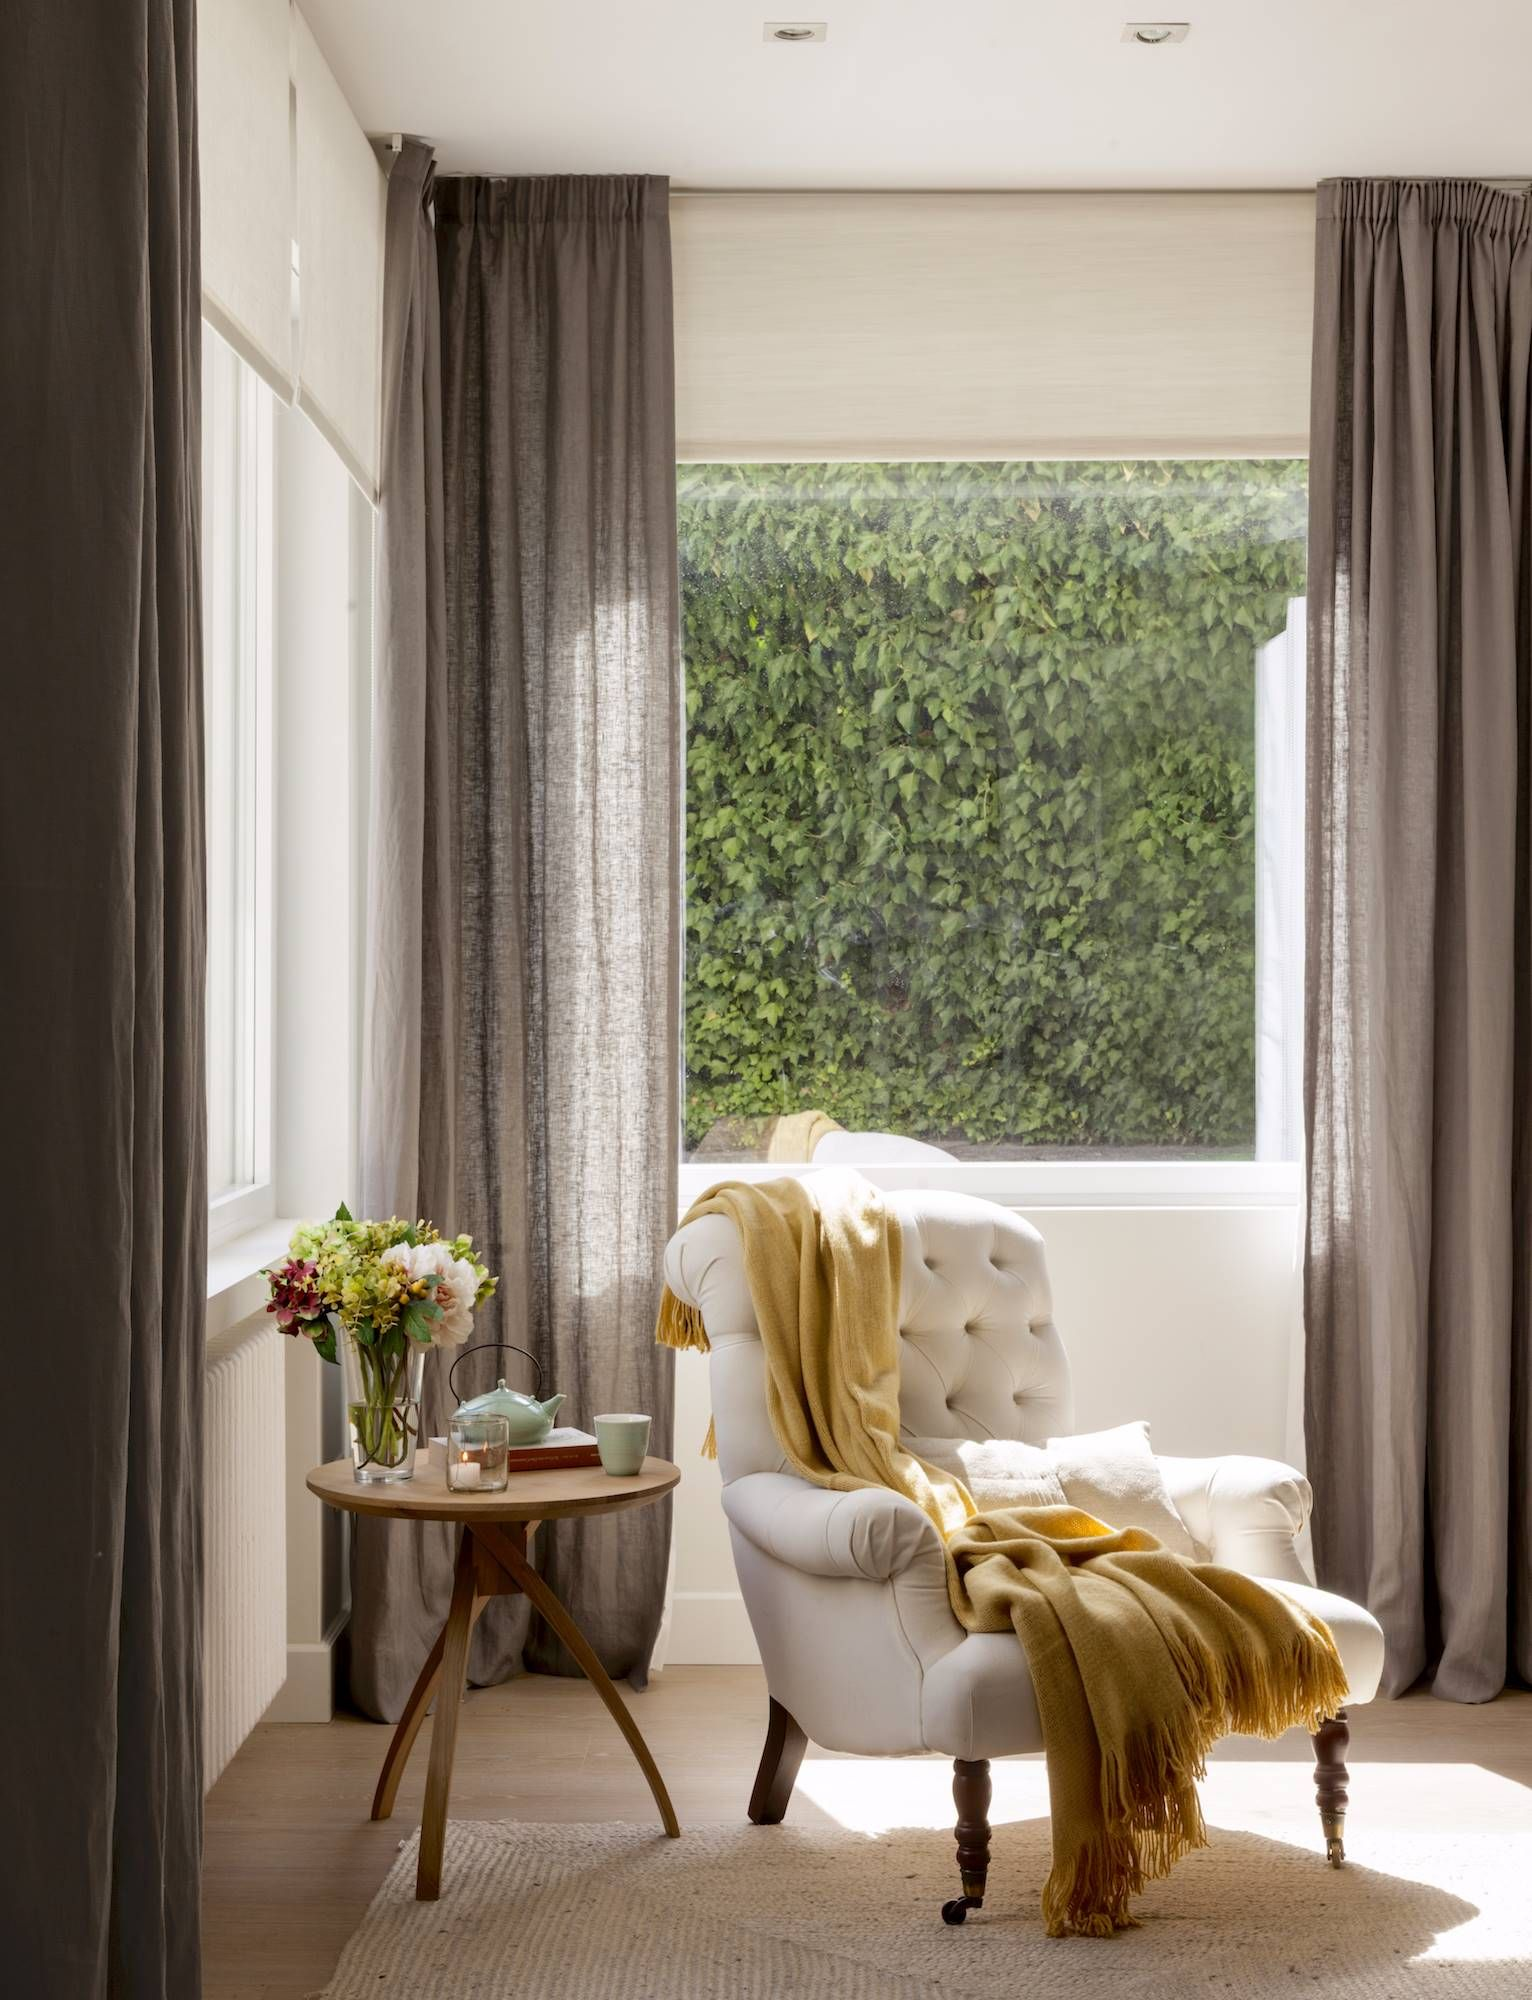 Caídas y screens | dream houses and perfect places en 2019 ...